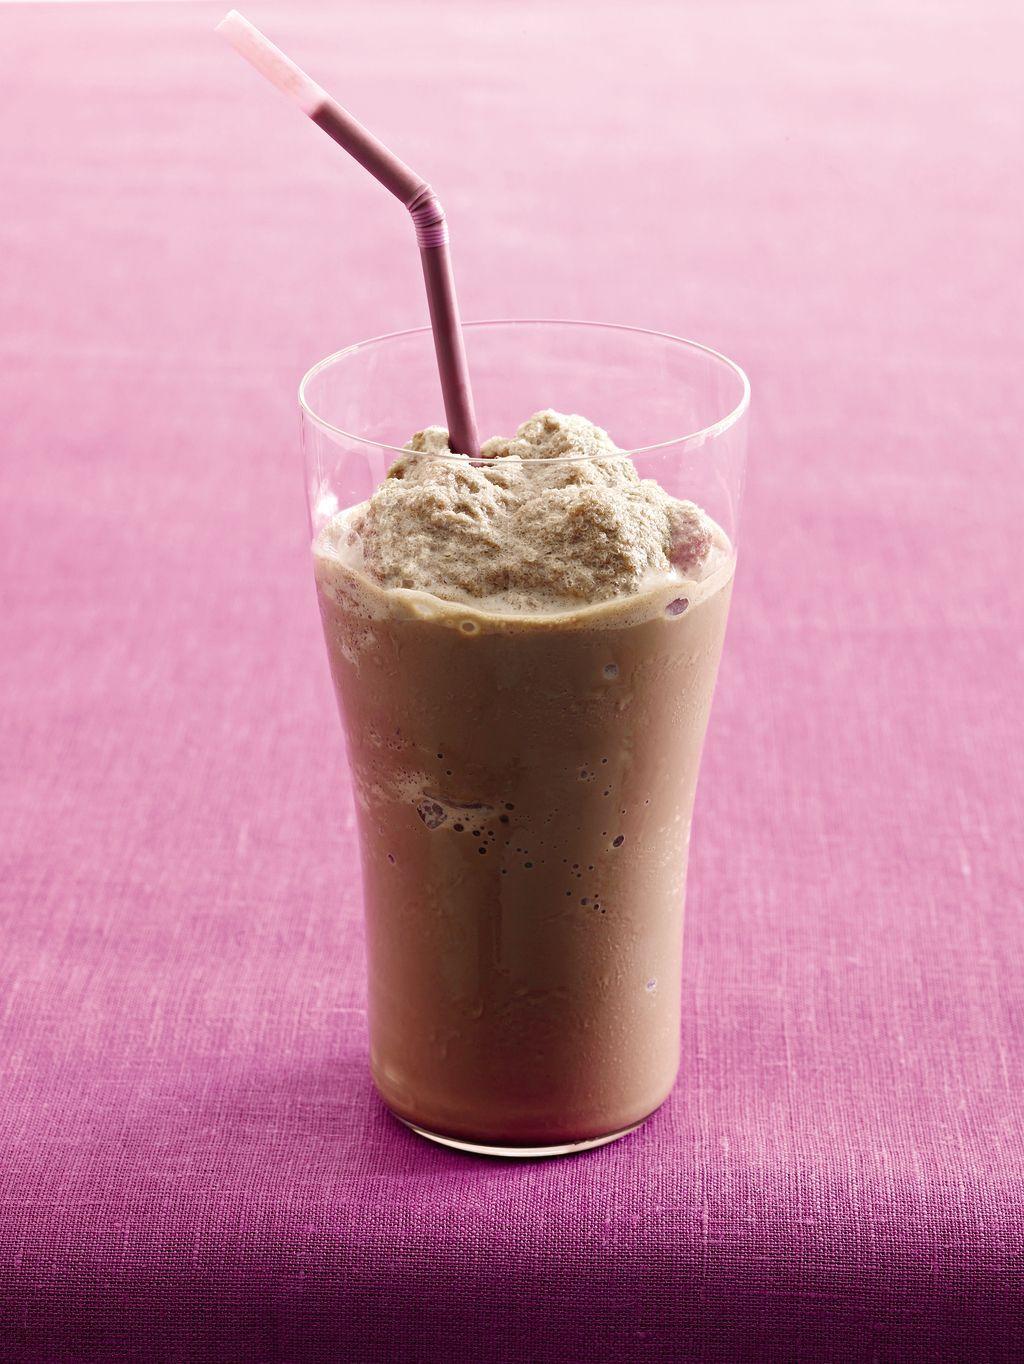 Frosty Chocolate Milkshake #healthychocolateshakes